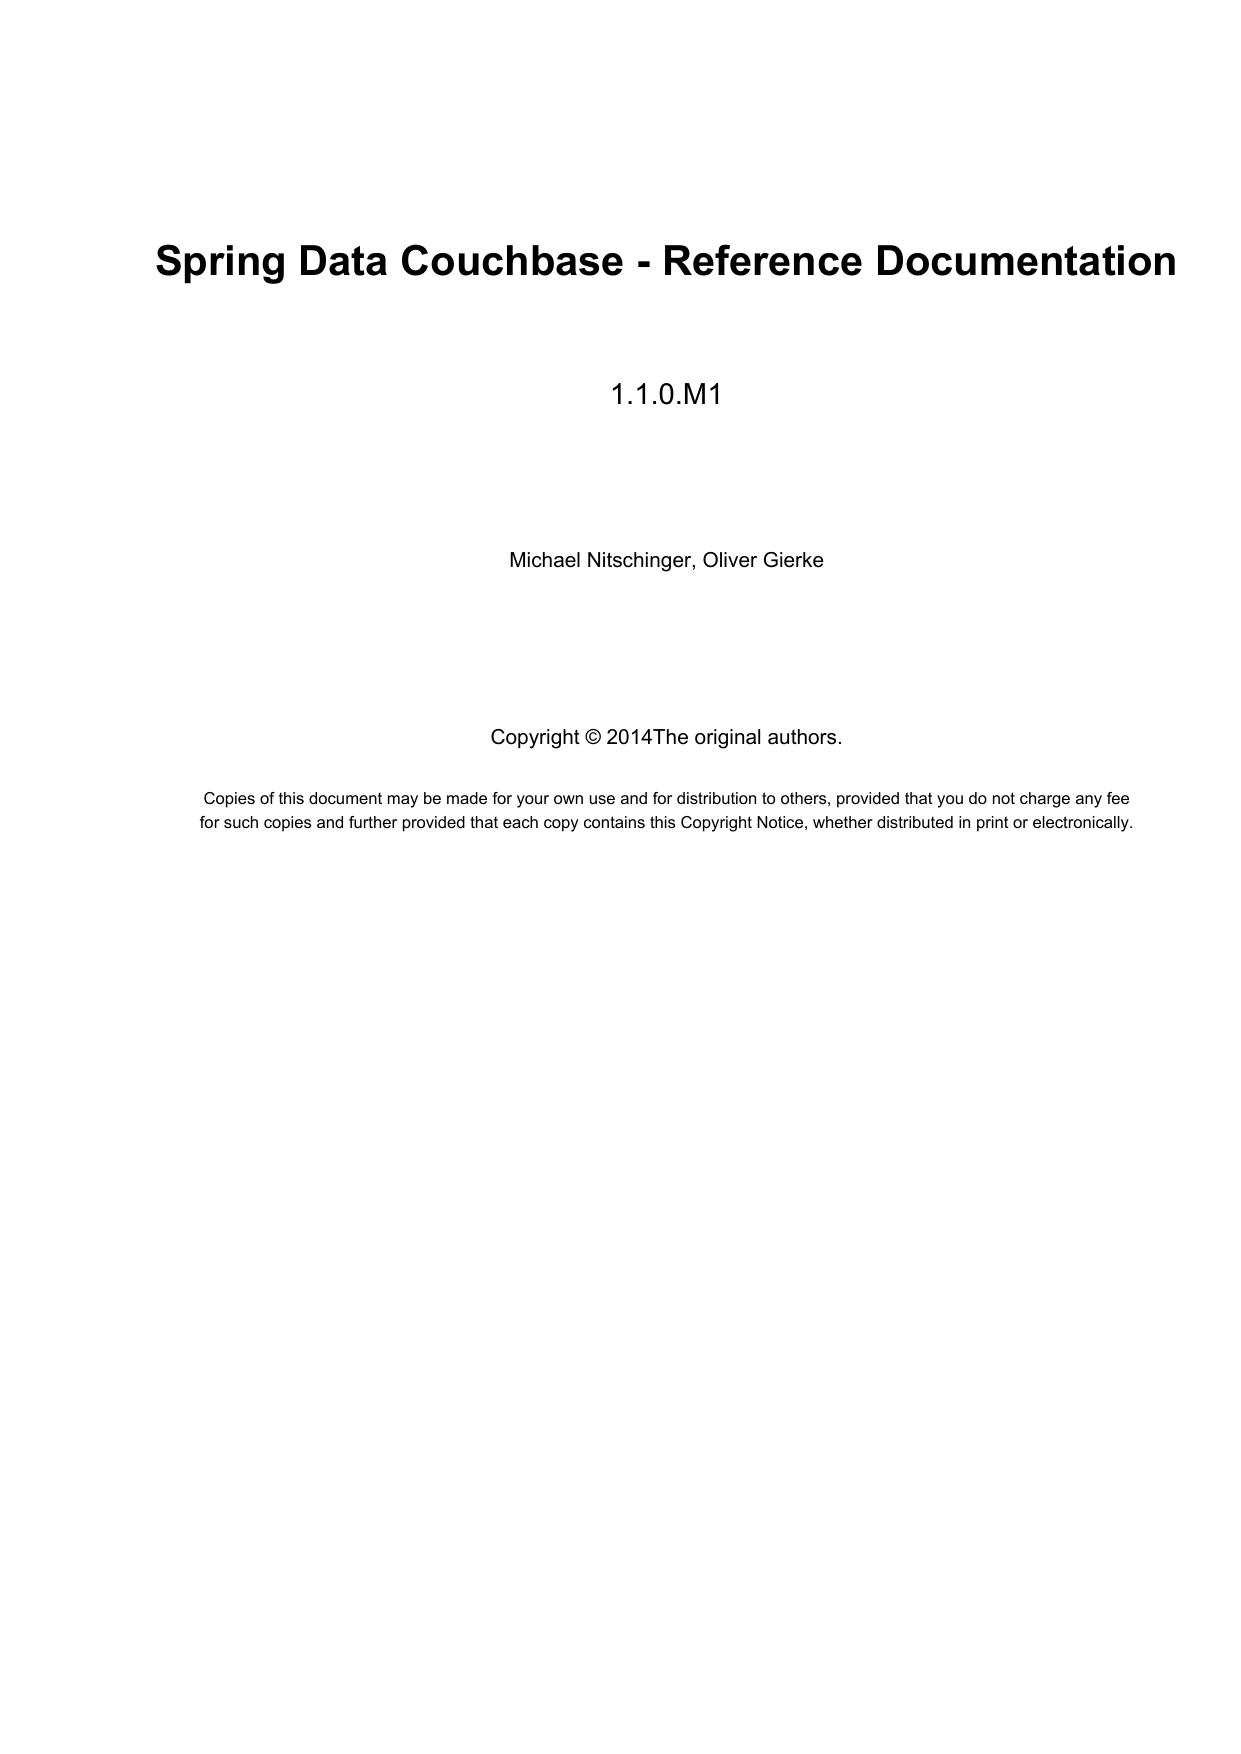 Spring Data Couchbase - Reference Documentation | manualzz com